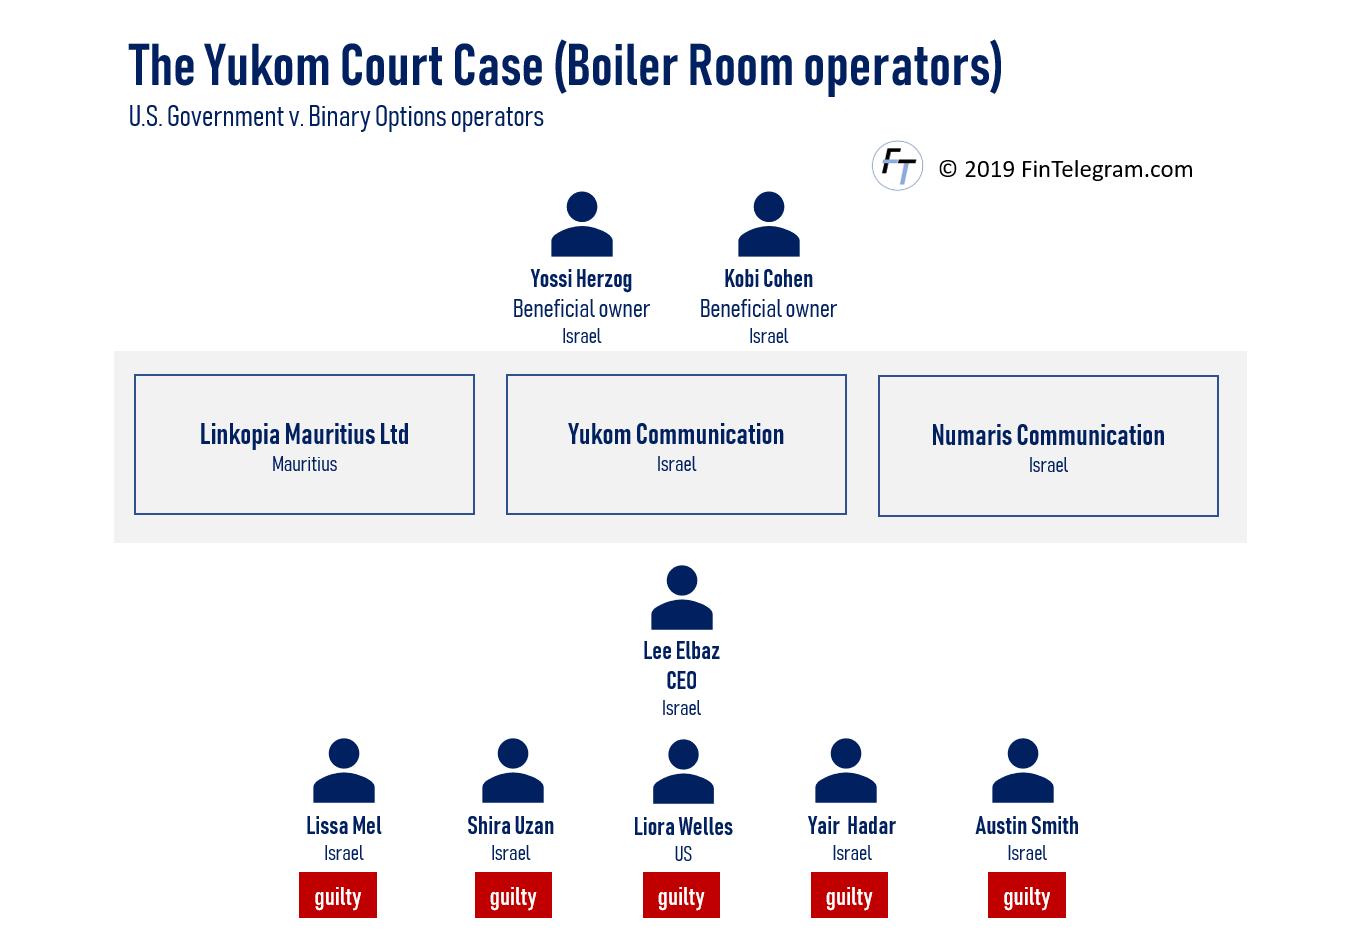 Yukom Court Case with Lee Elbaz Yossi Herzog and Kobi Cohen